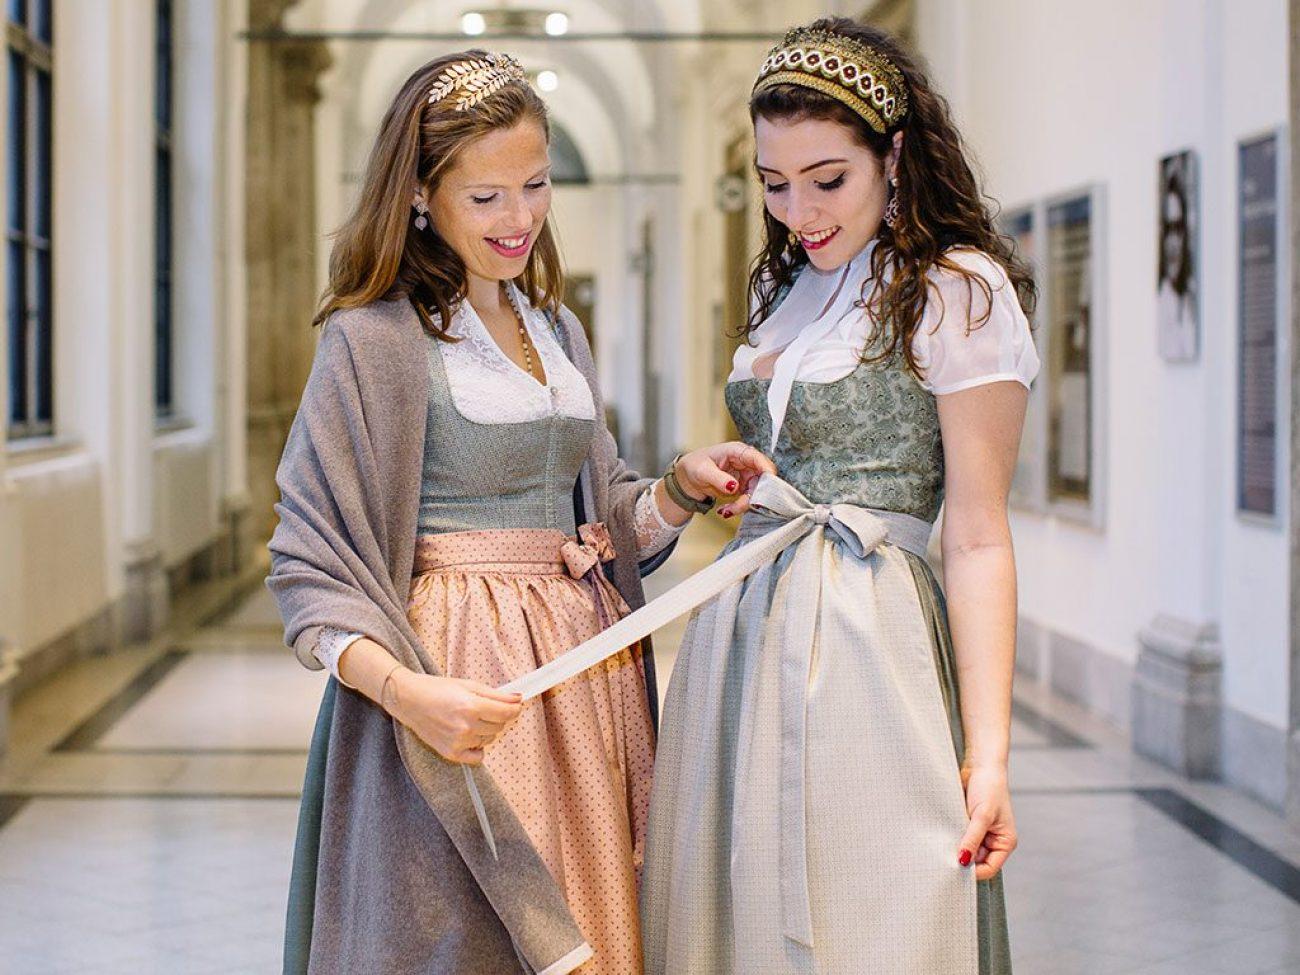 Salzburg Guide Shopping - Hanna Trachten